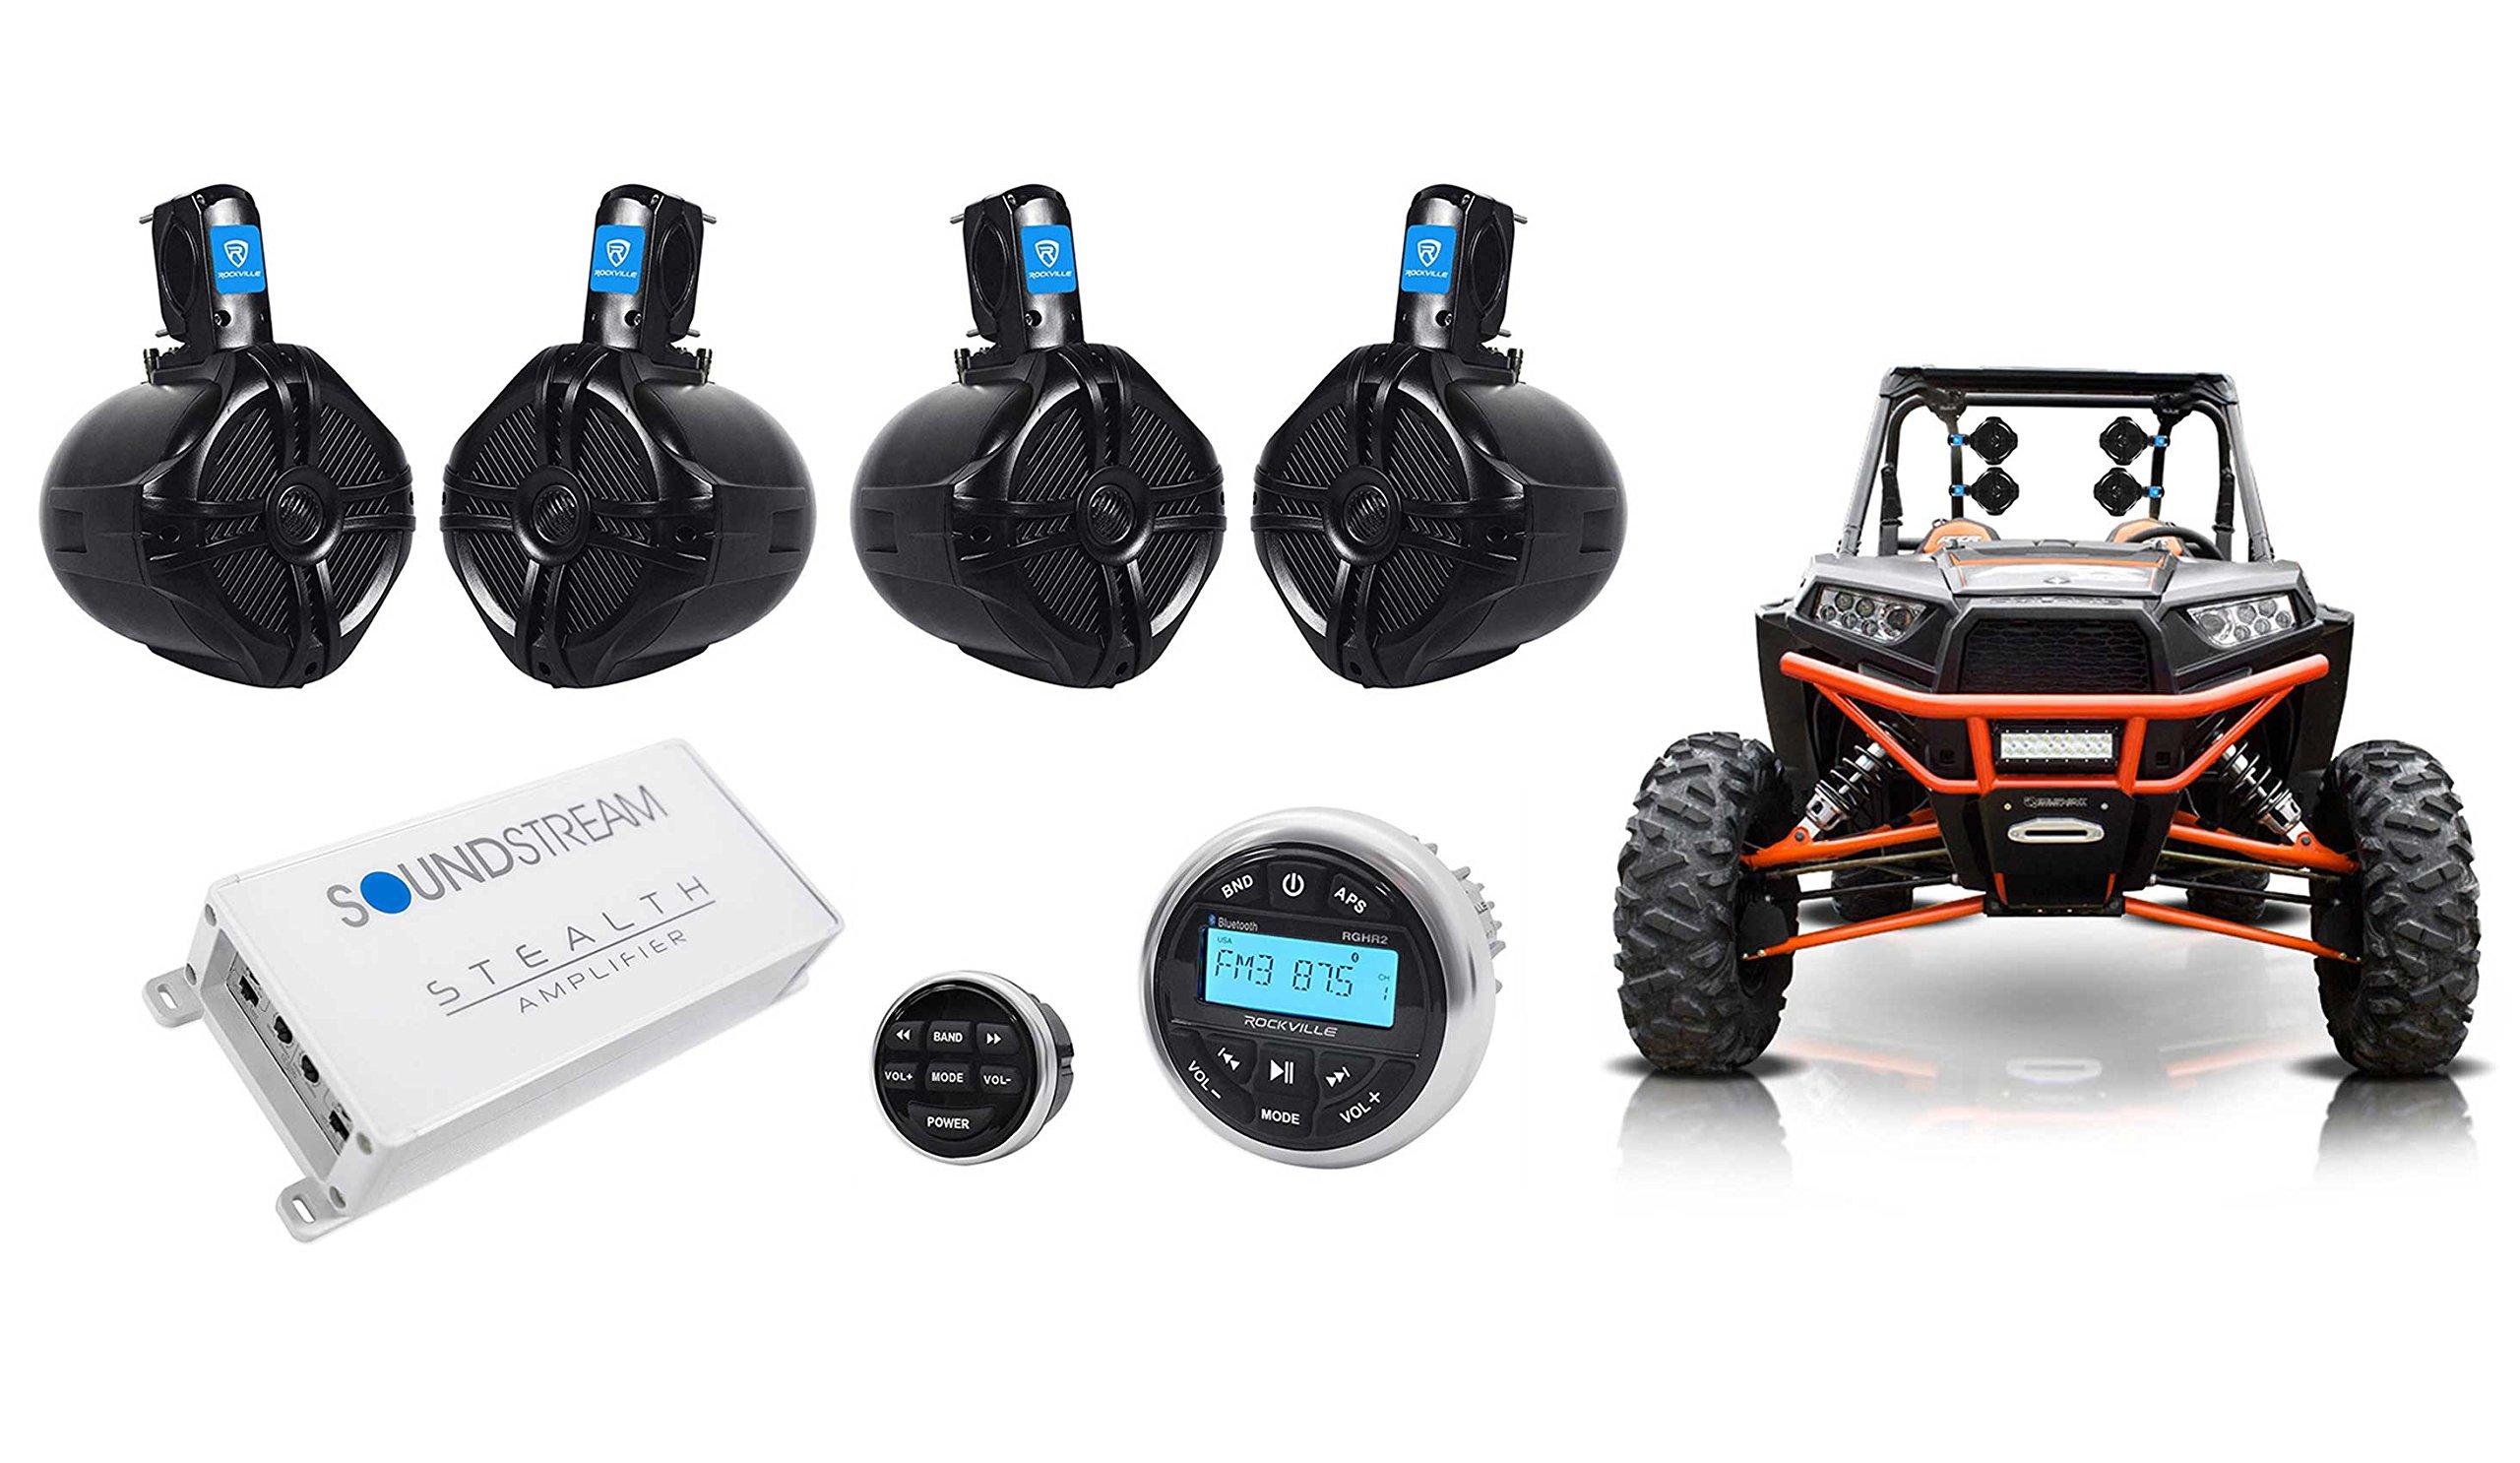 Rockville Bluetooth Receiver+4) 6.5'' Tower Speakers+4-Ch Amplifier RZR/ATV/UTV